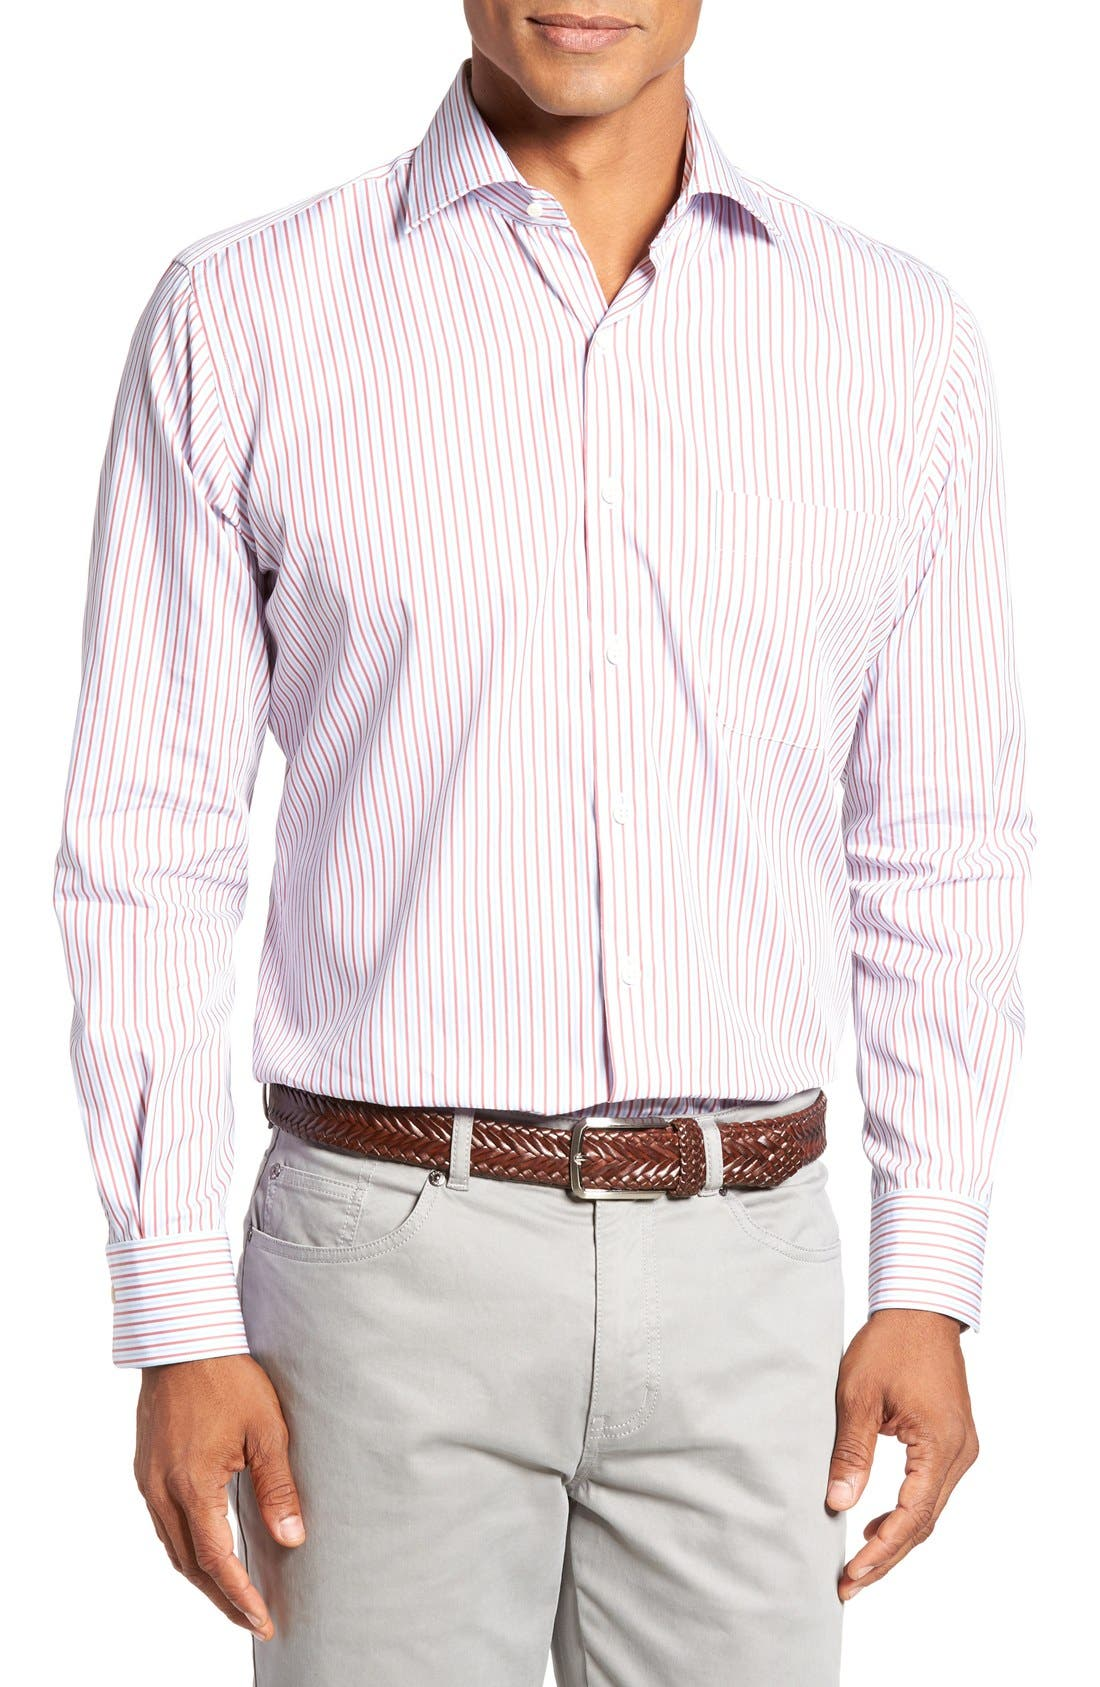 Main Image - Peter Millar Summer Stripe Regular Fit Sport Shirt